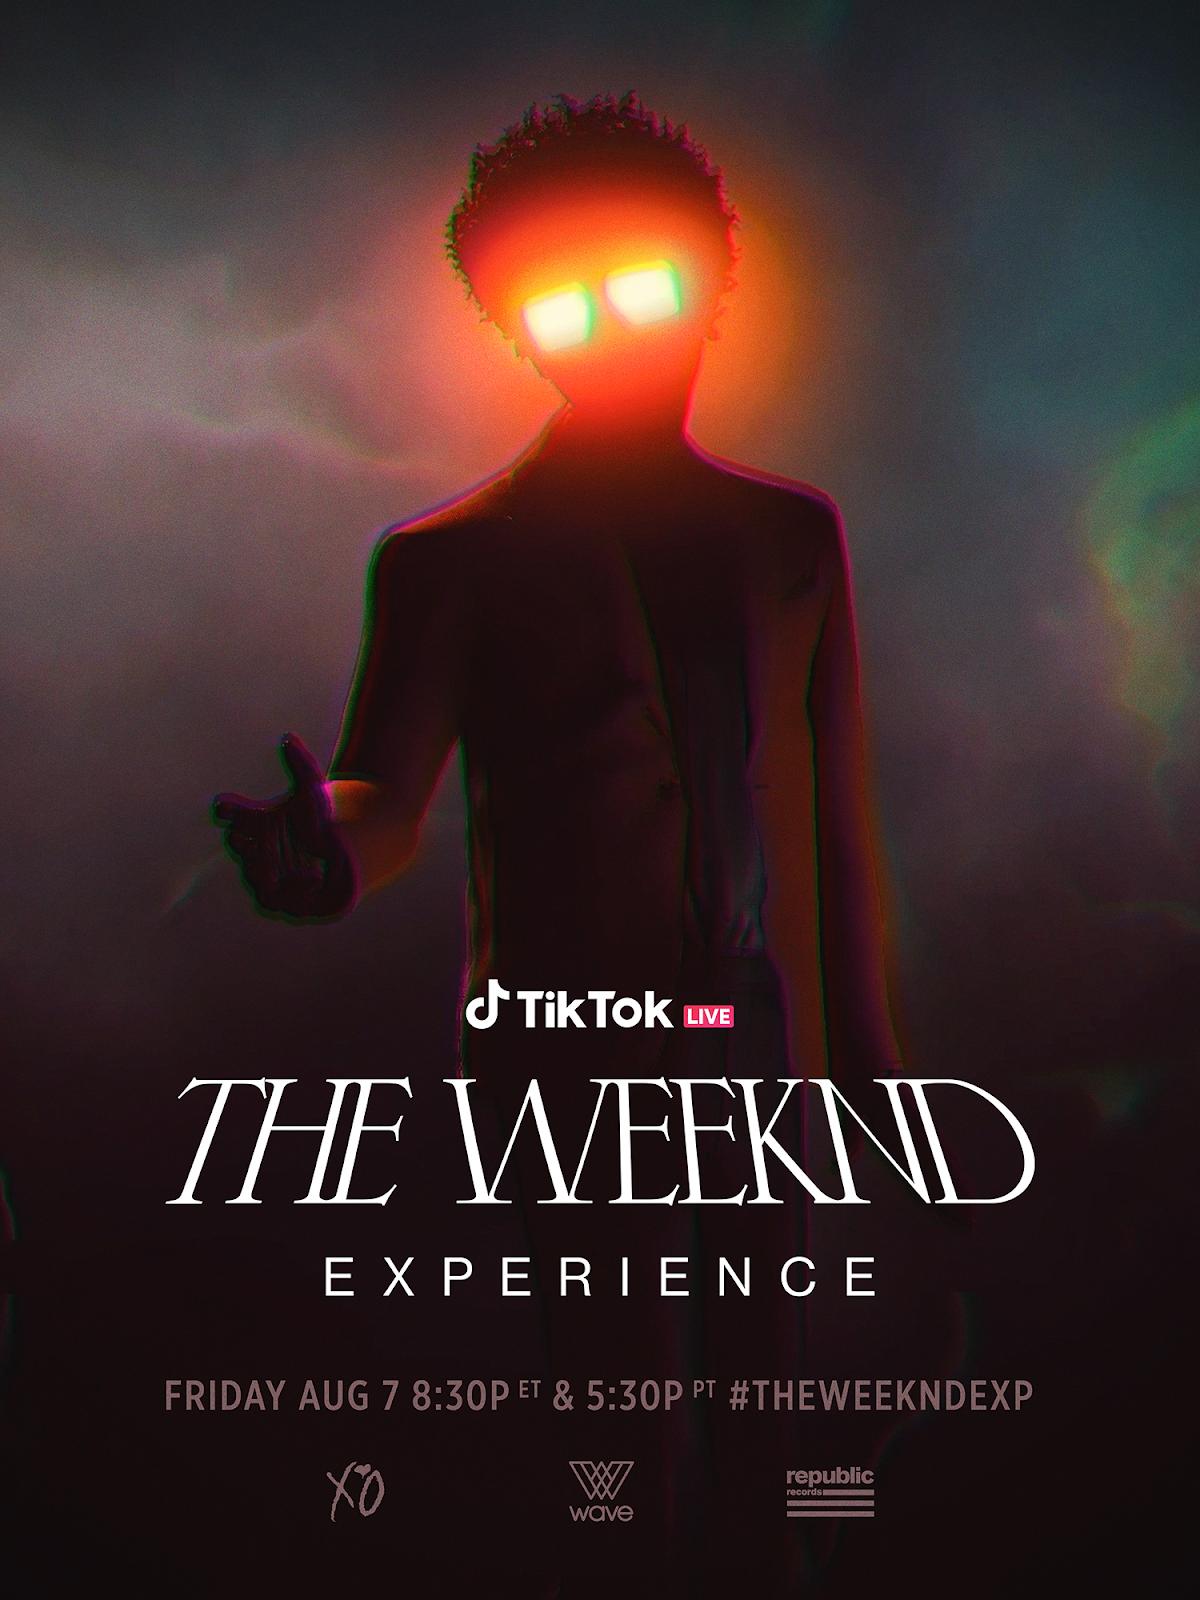 the weeknd experience tiktok.pn posterg